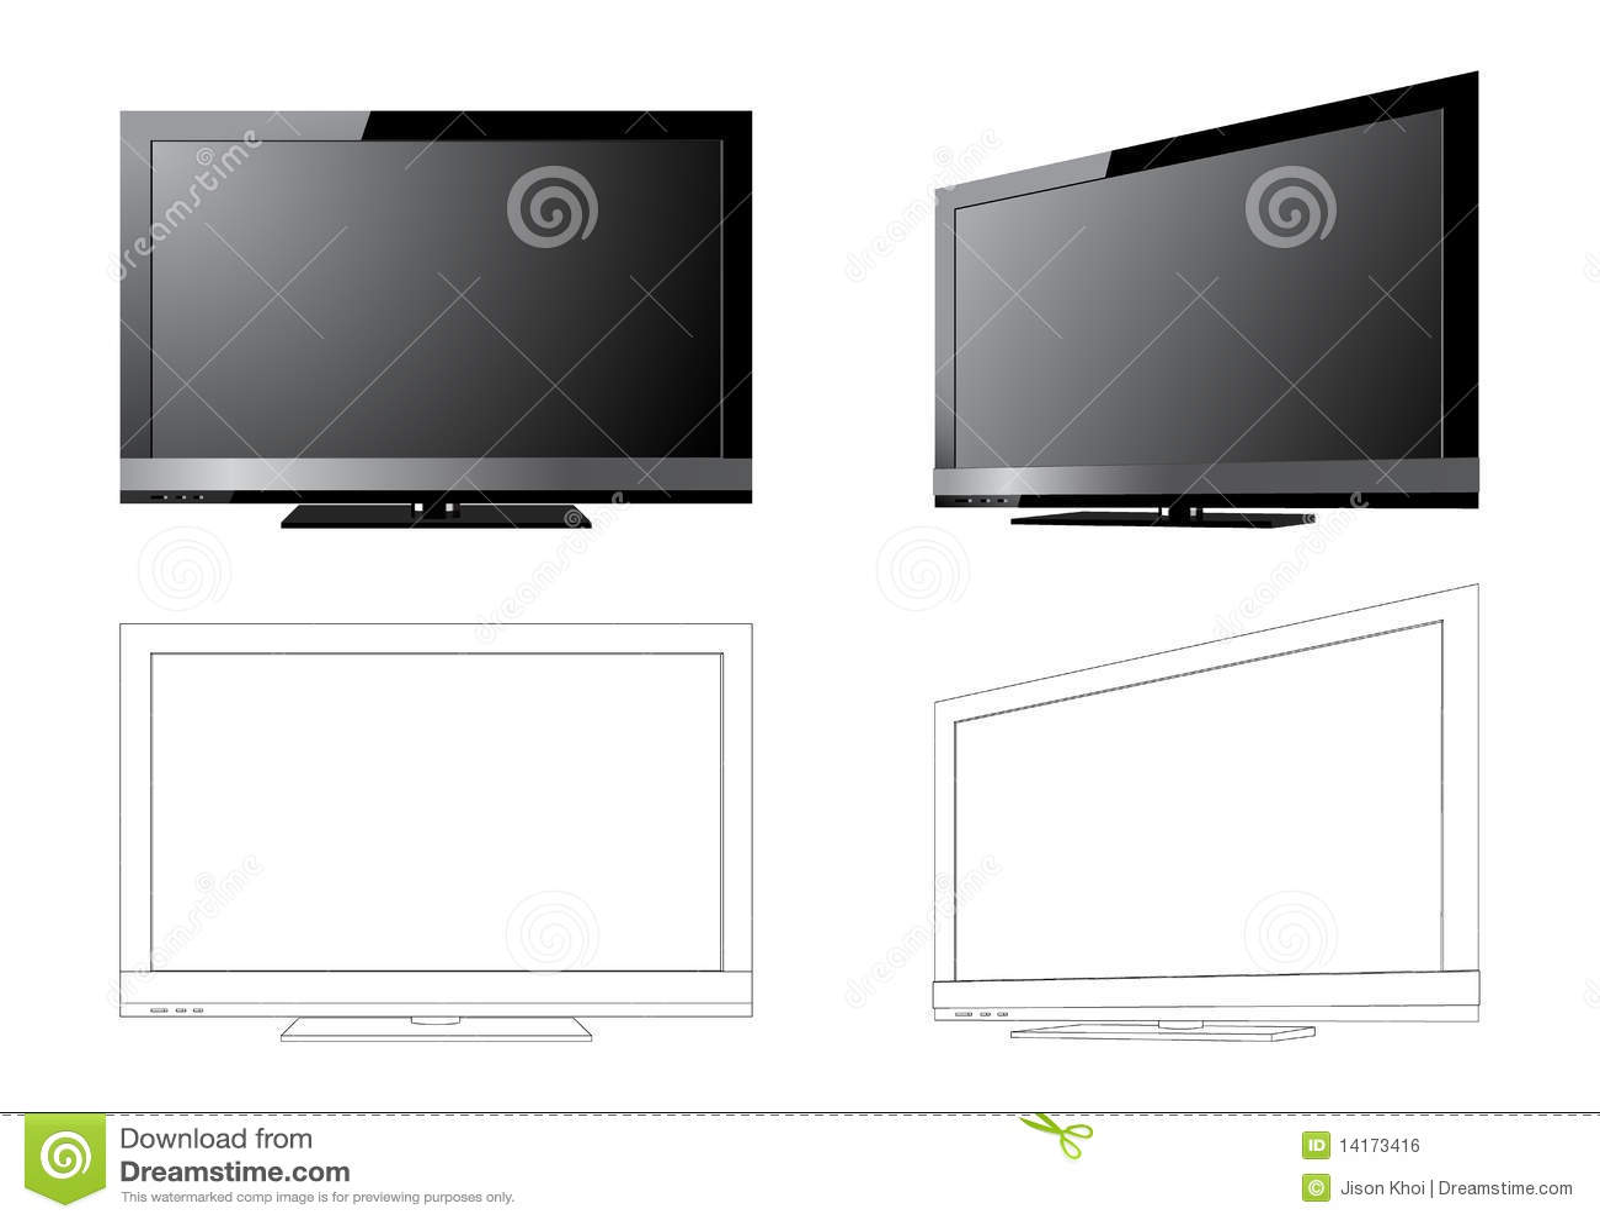 LCD-FERNSEHAPPARAT